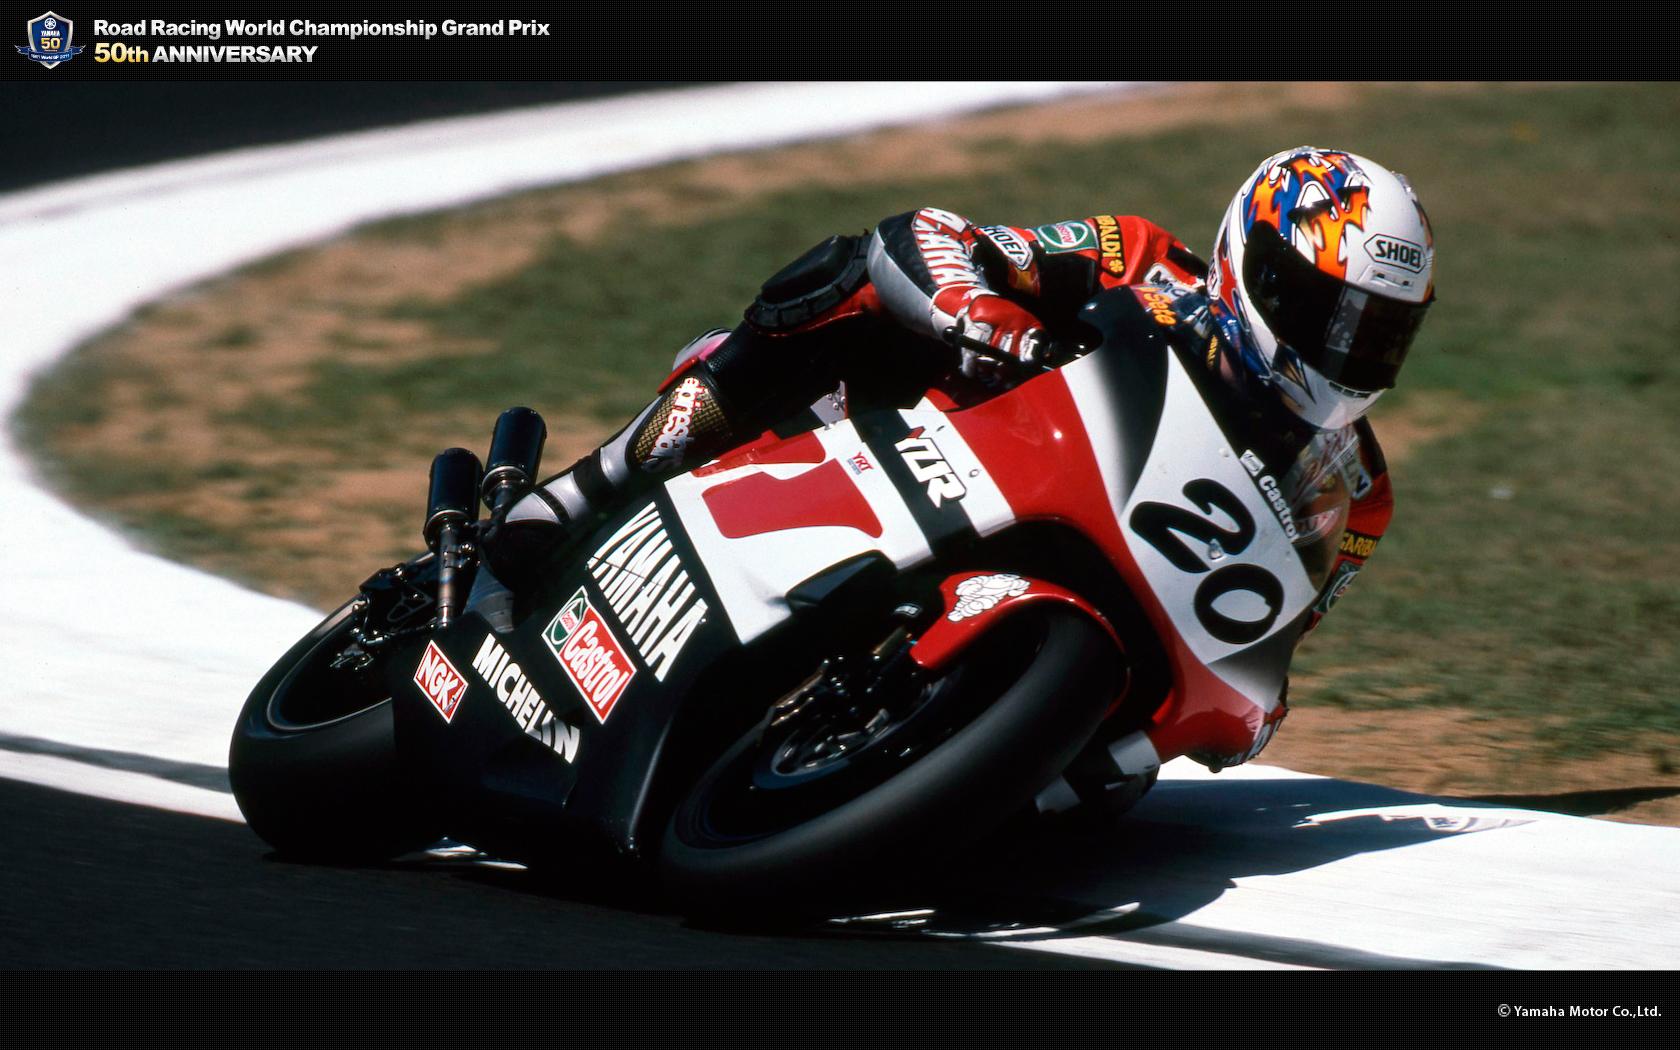 Sete Gibernau - race | Yamaha Motor Co., Ltd.